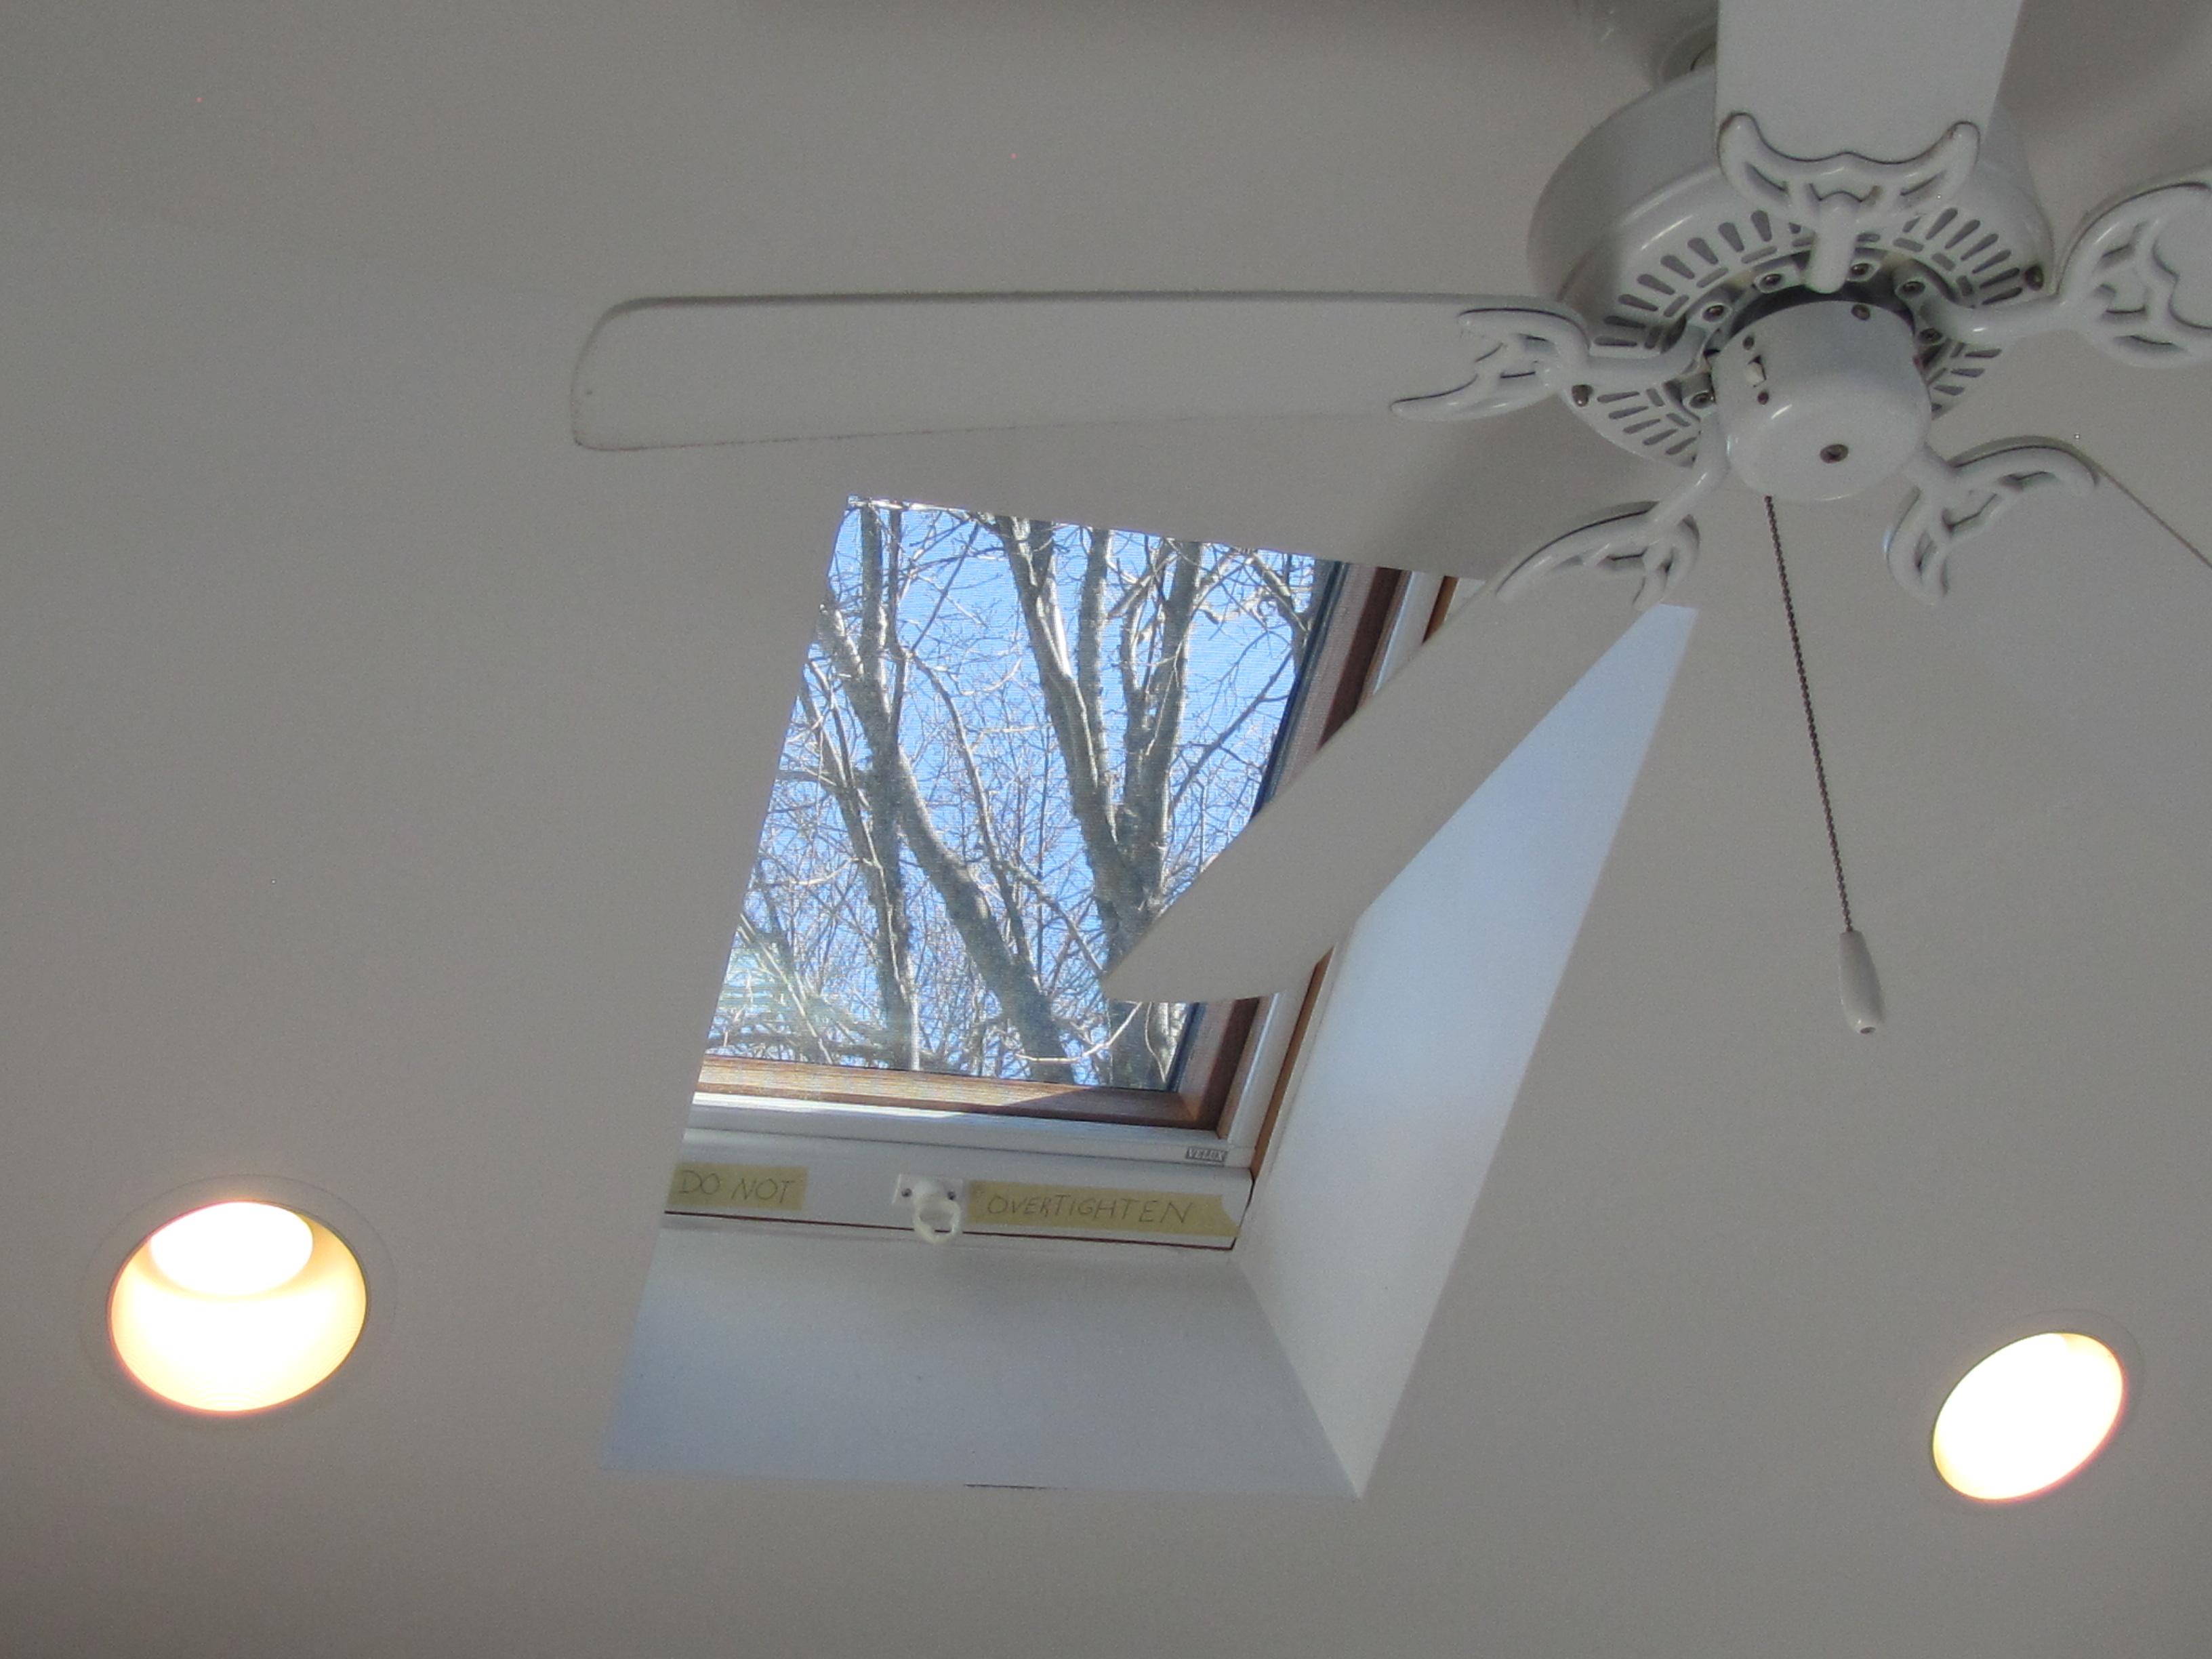 Kitchen Skylight and Fan